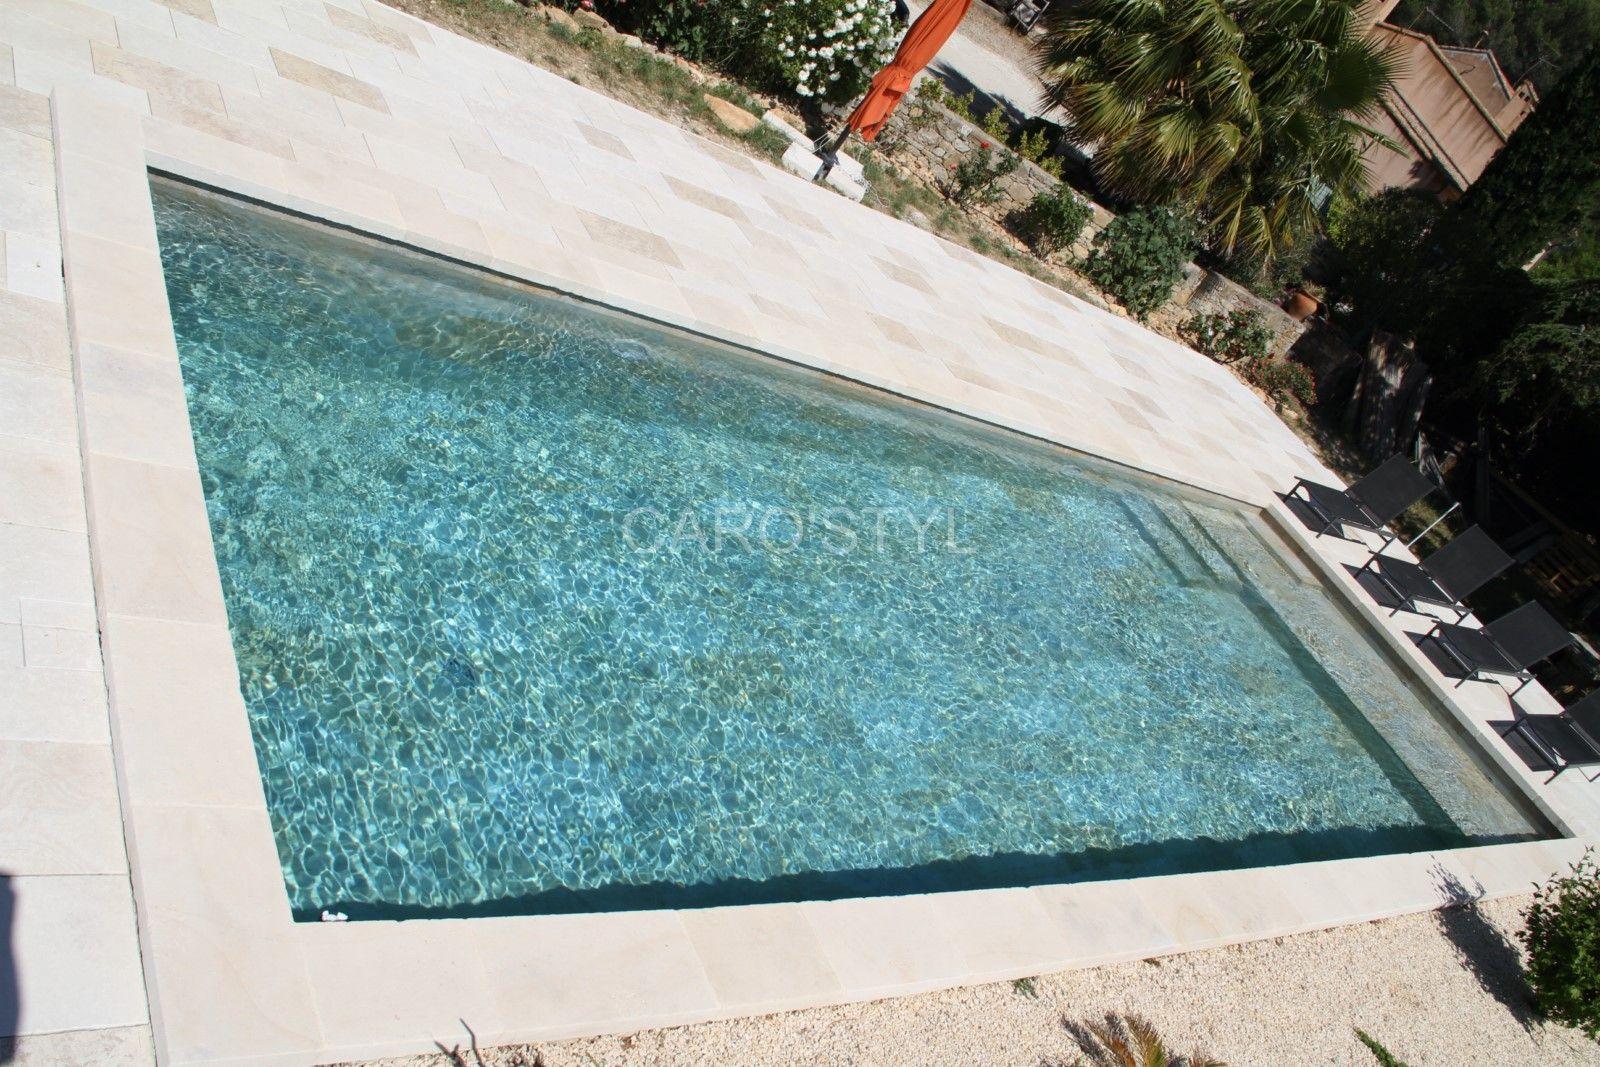 Piscine En Carrelage Sable De Phuket Carrelage Et Salle De Bain La Seyne Var Caro Styl Piscine Carrelage Piscine Pool House